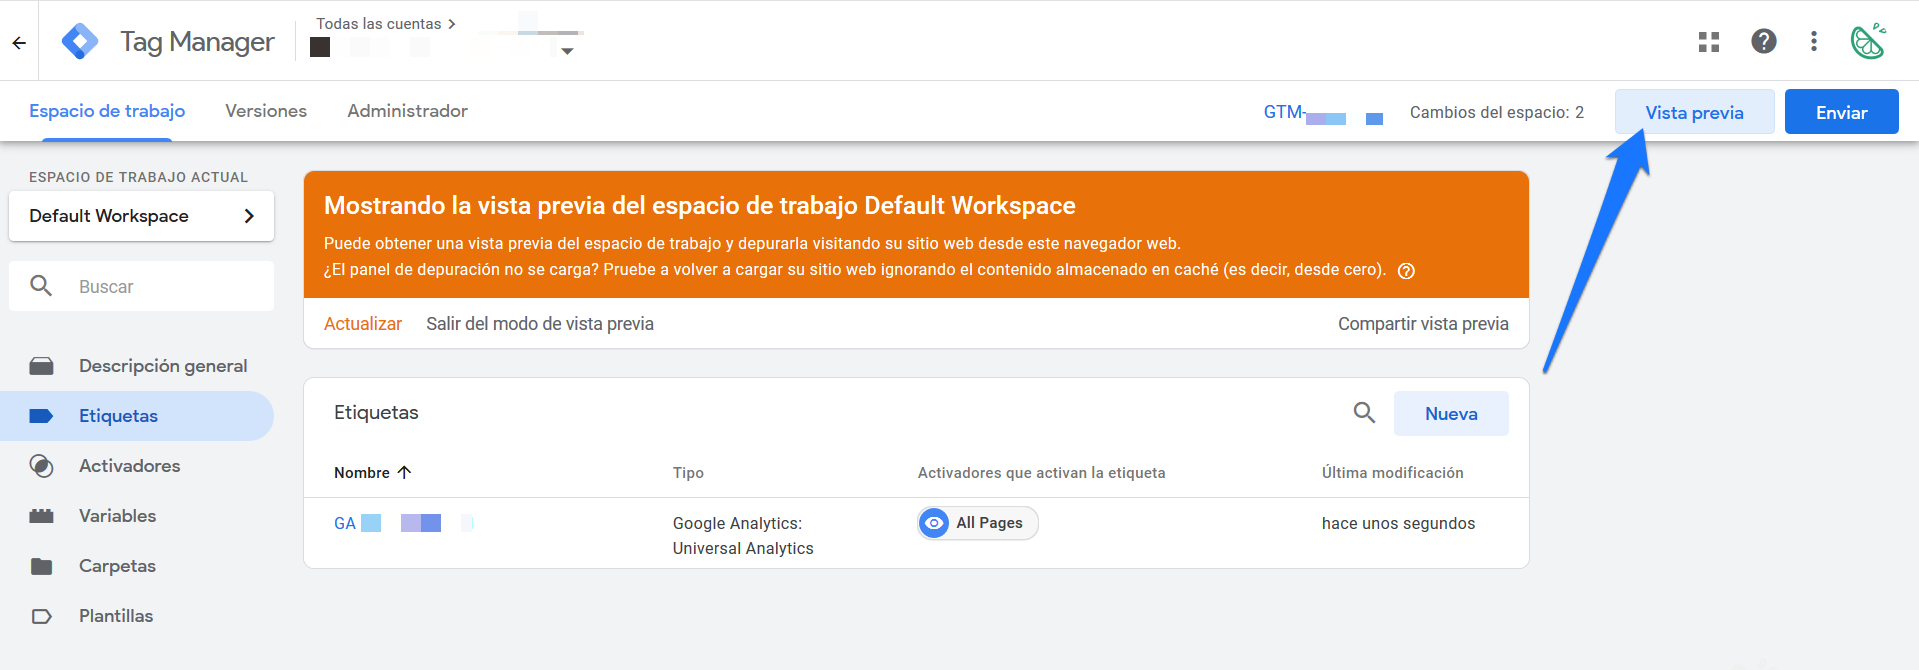 Comprobar que Google Tag Manager está instalado